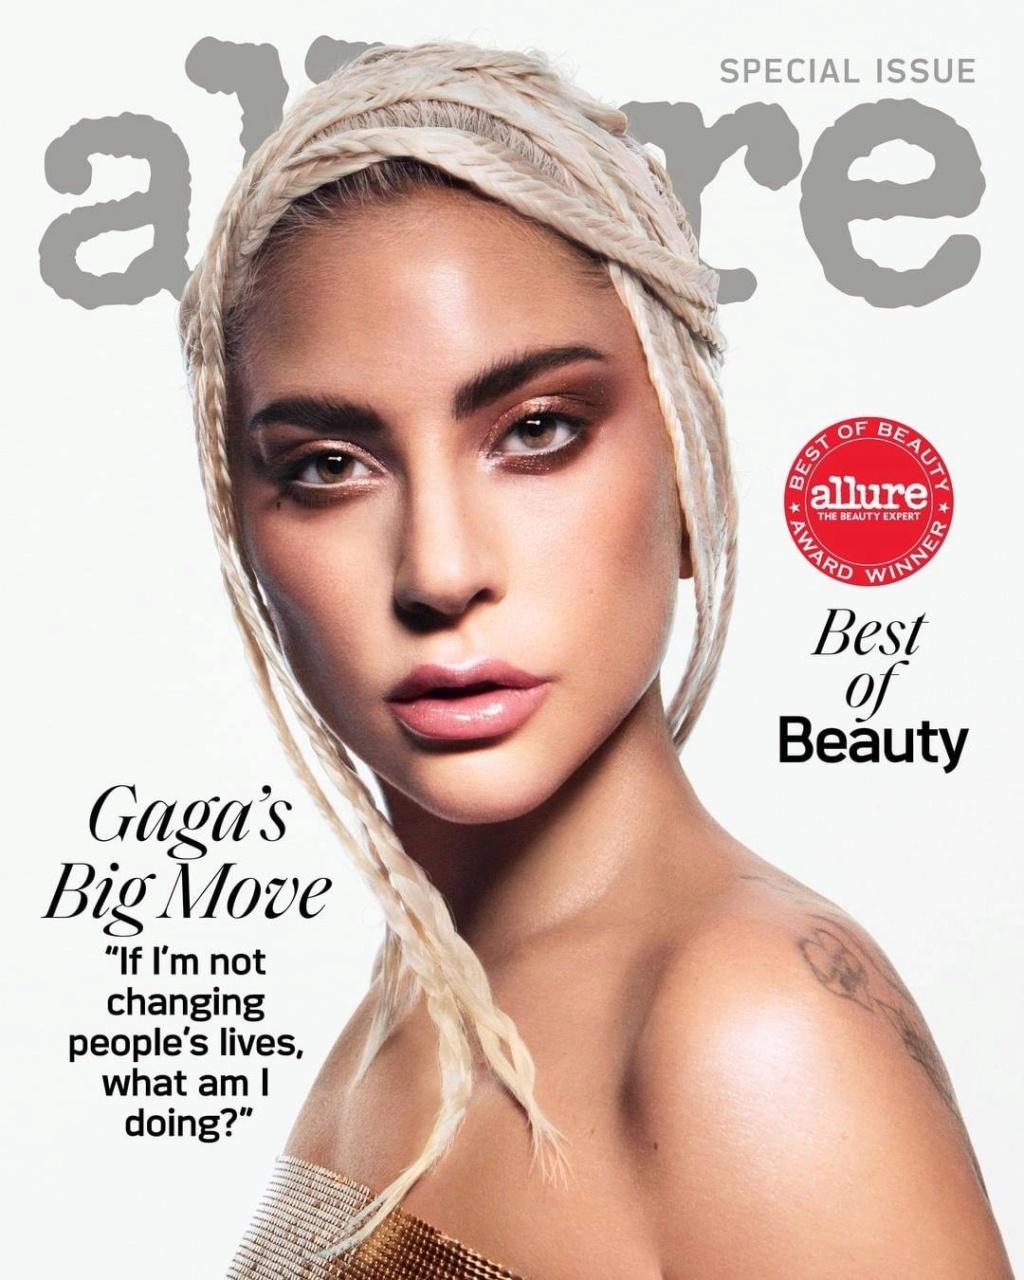 Lady Gaga - Σελίδα 49 8ad33d10